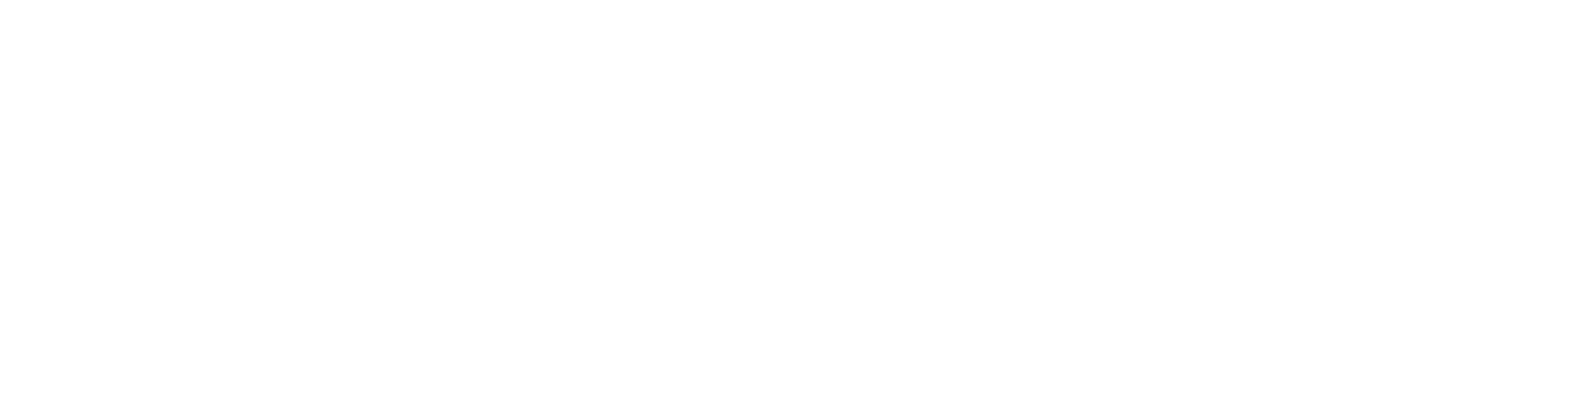 Union Logo Links to website